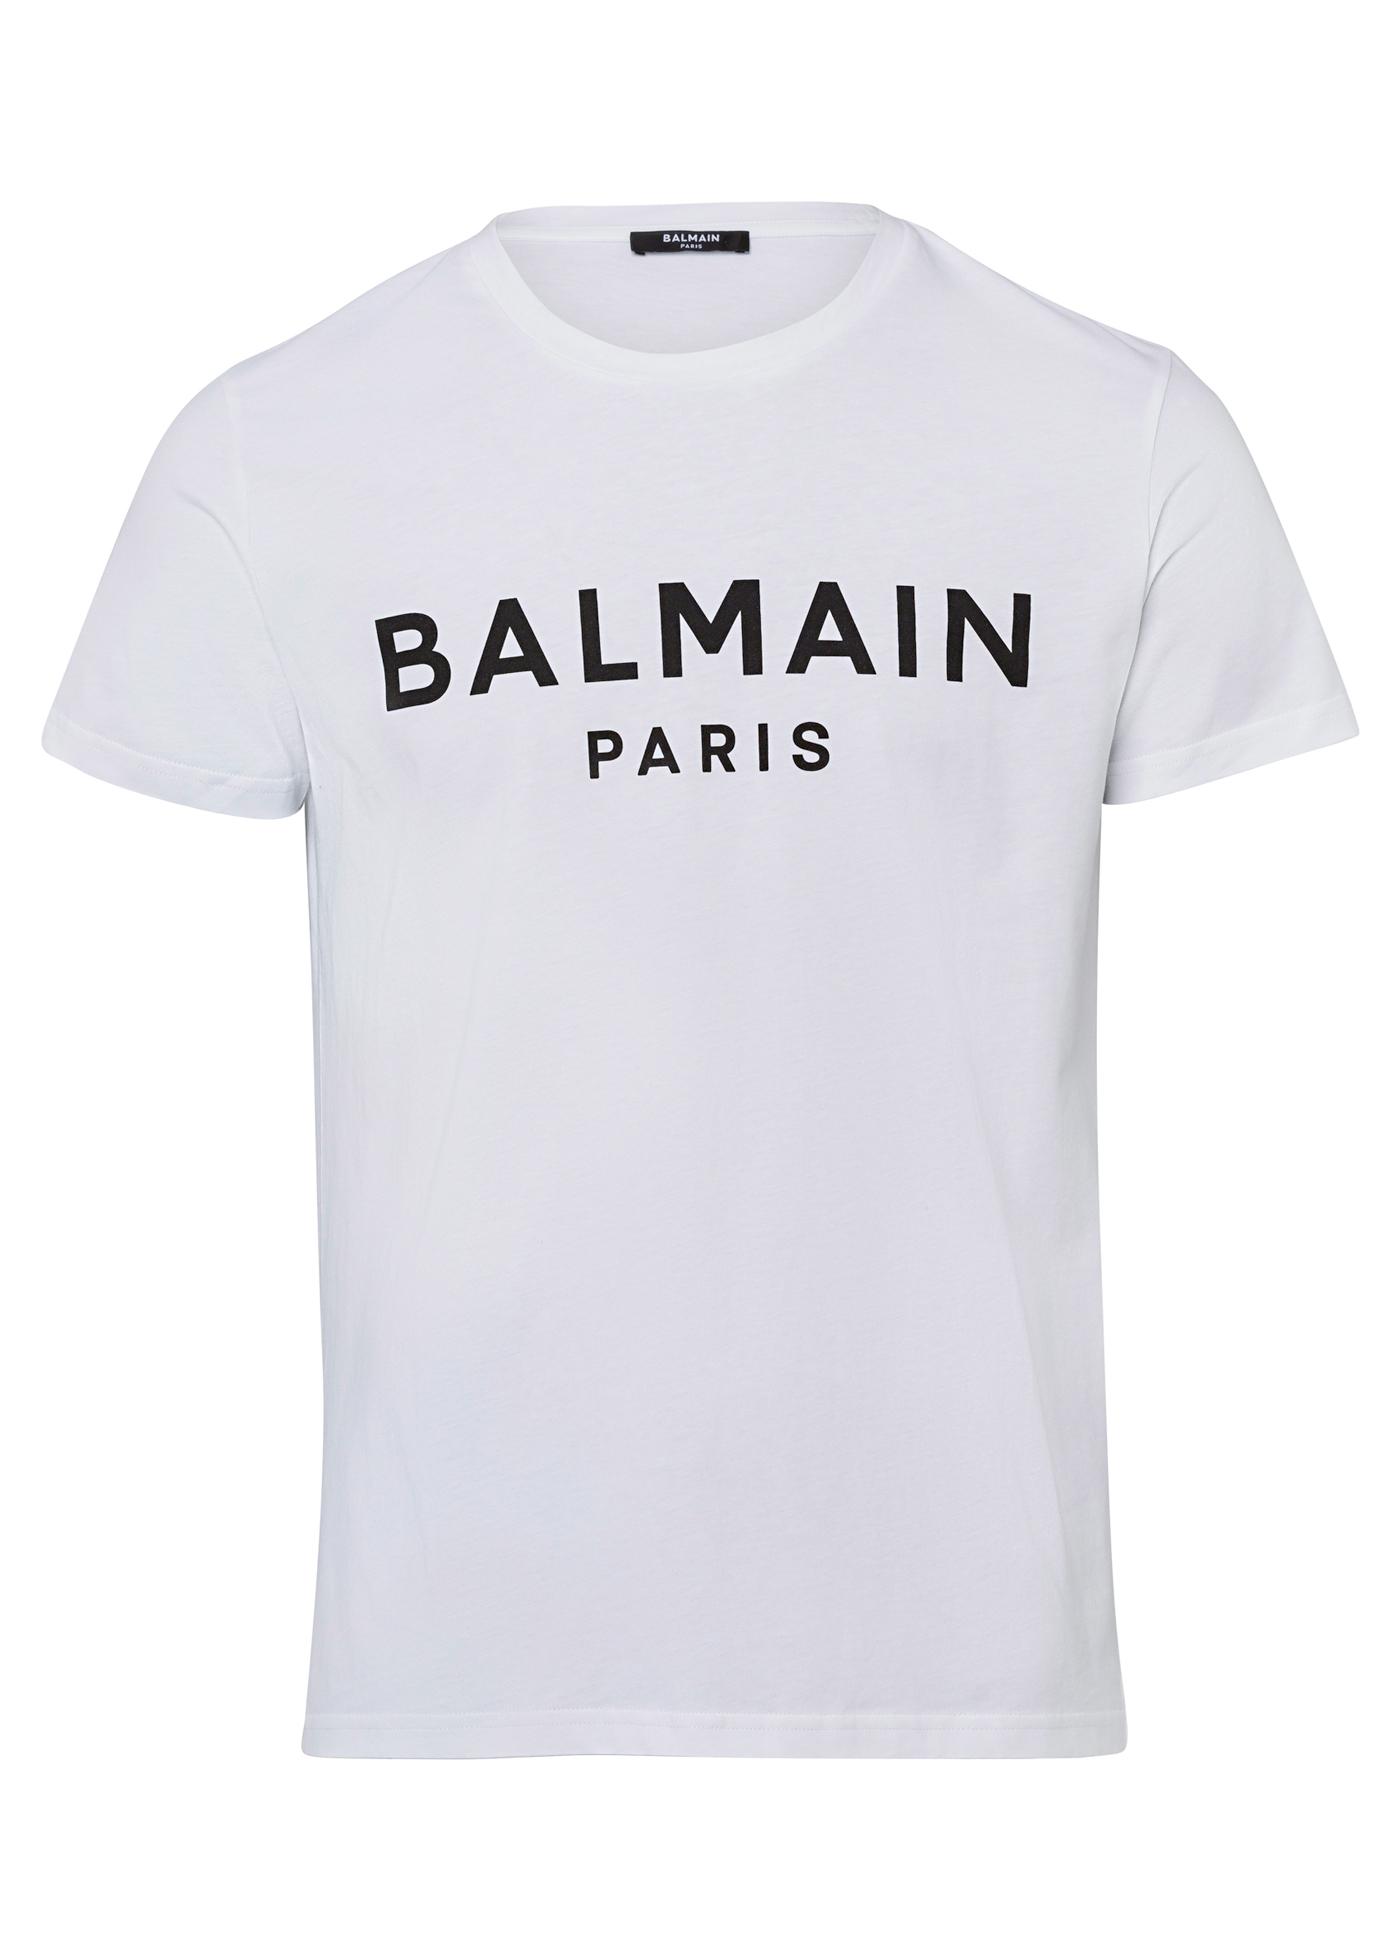 BALMAIN PRINTED T-SHIRT image number 0